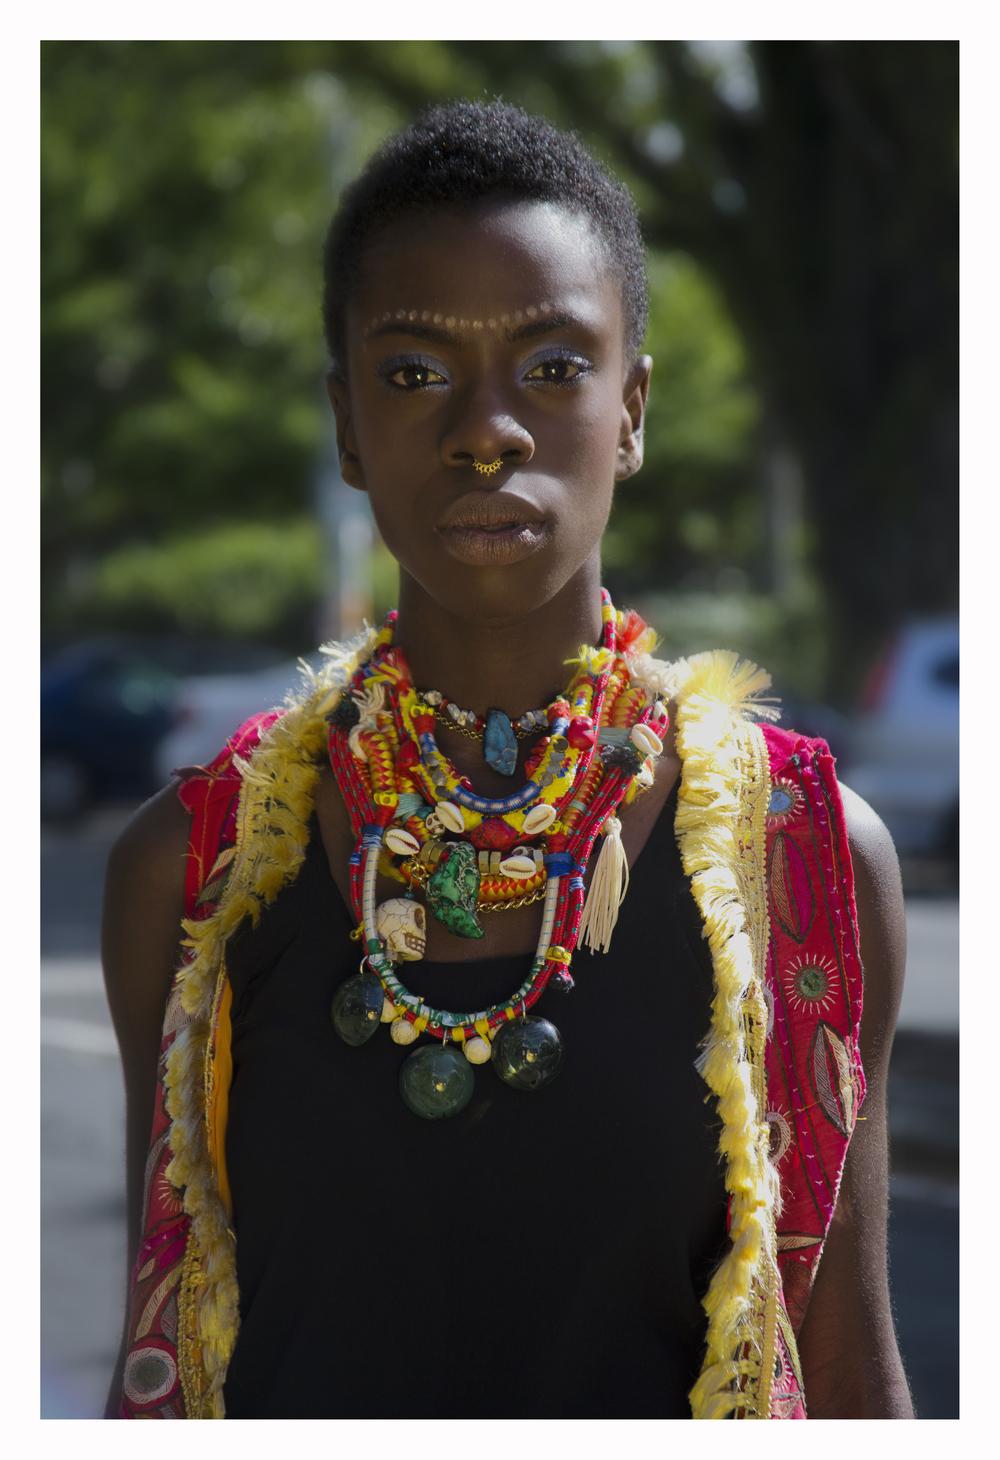 Model - Janina Asiedu Stylist - Makanaka Tuwe Photographer - Constanza Makeup - Stacey and Jayne